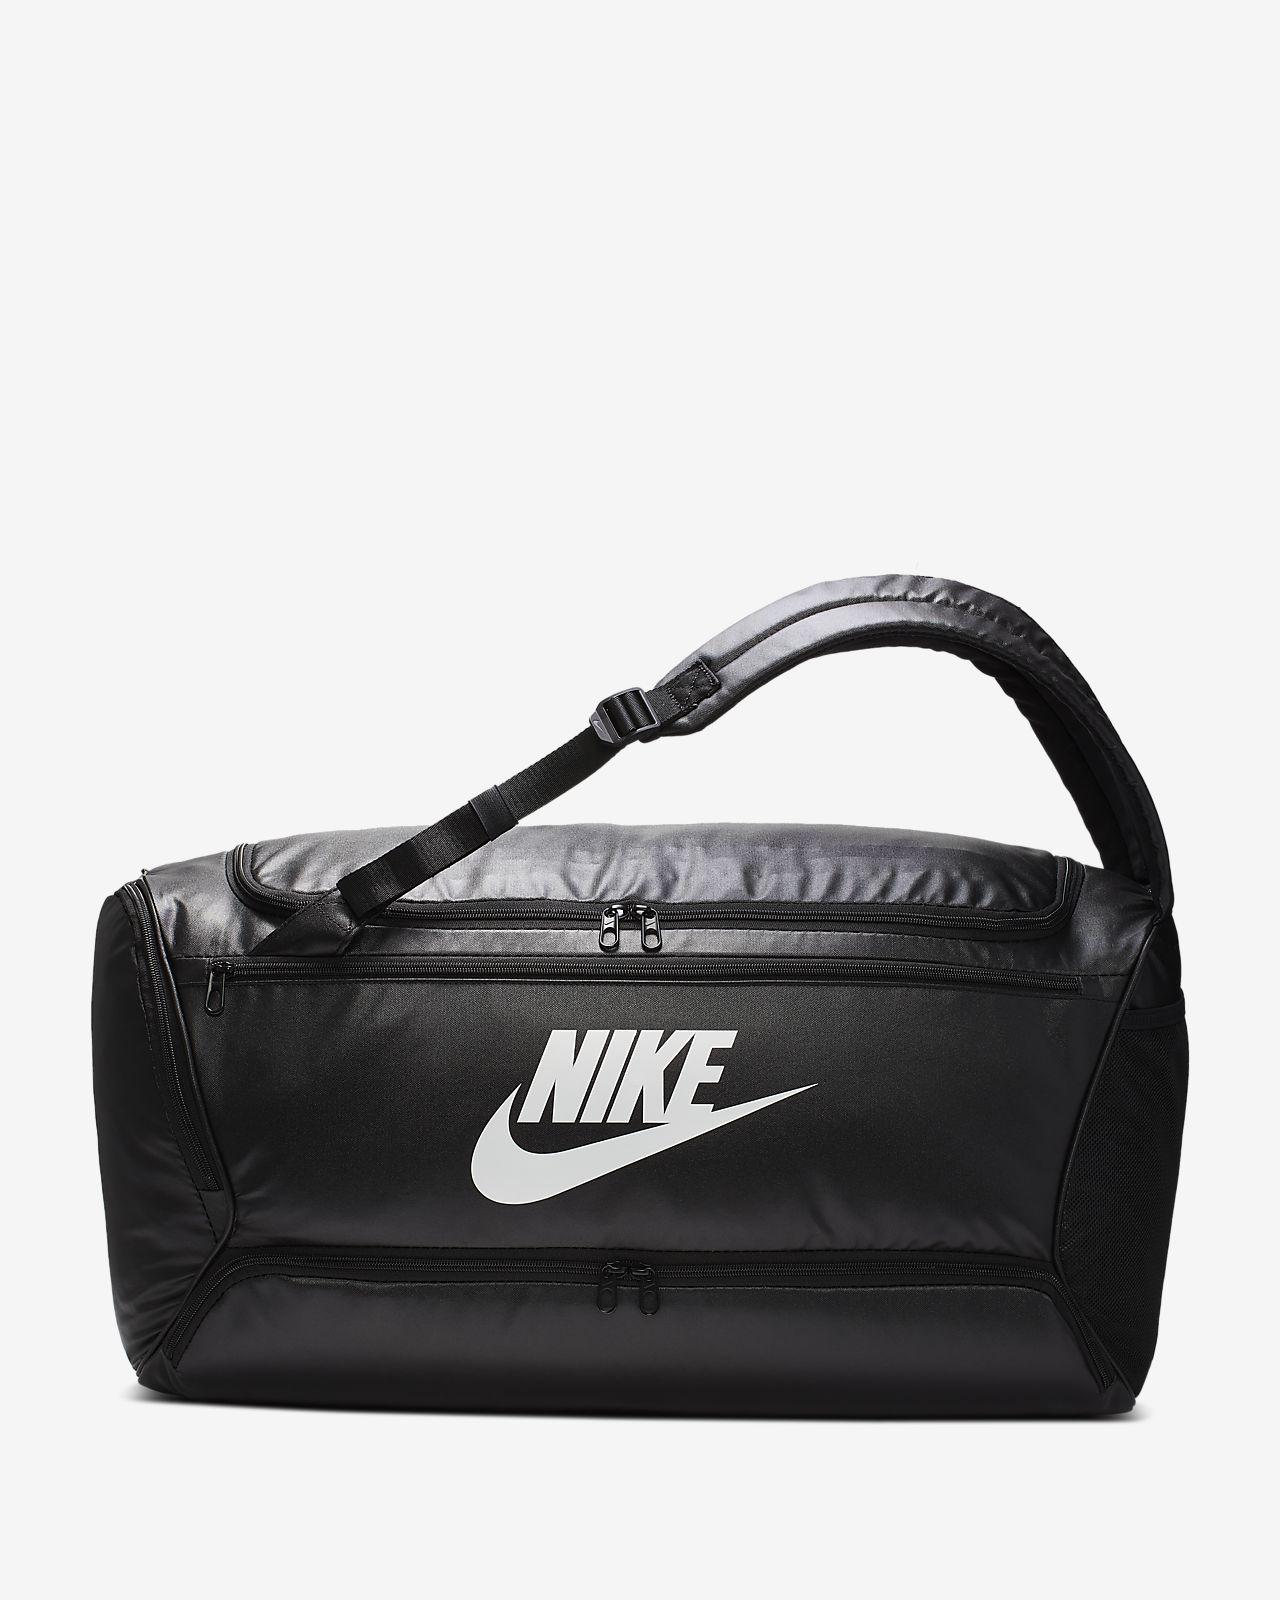 c6a54fce096 Nike Brasilia Aanpasbare sporttas/rugzak